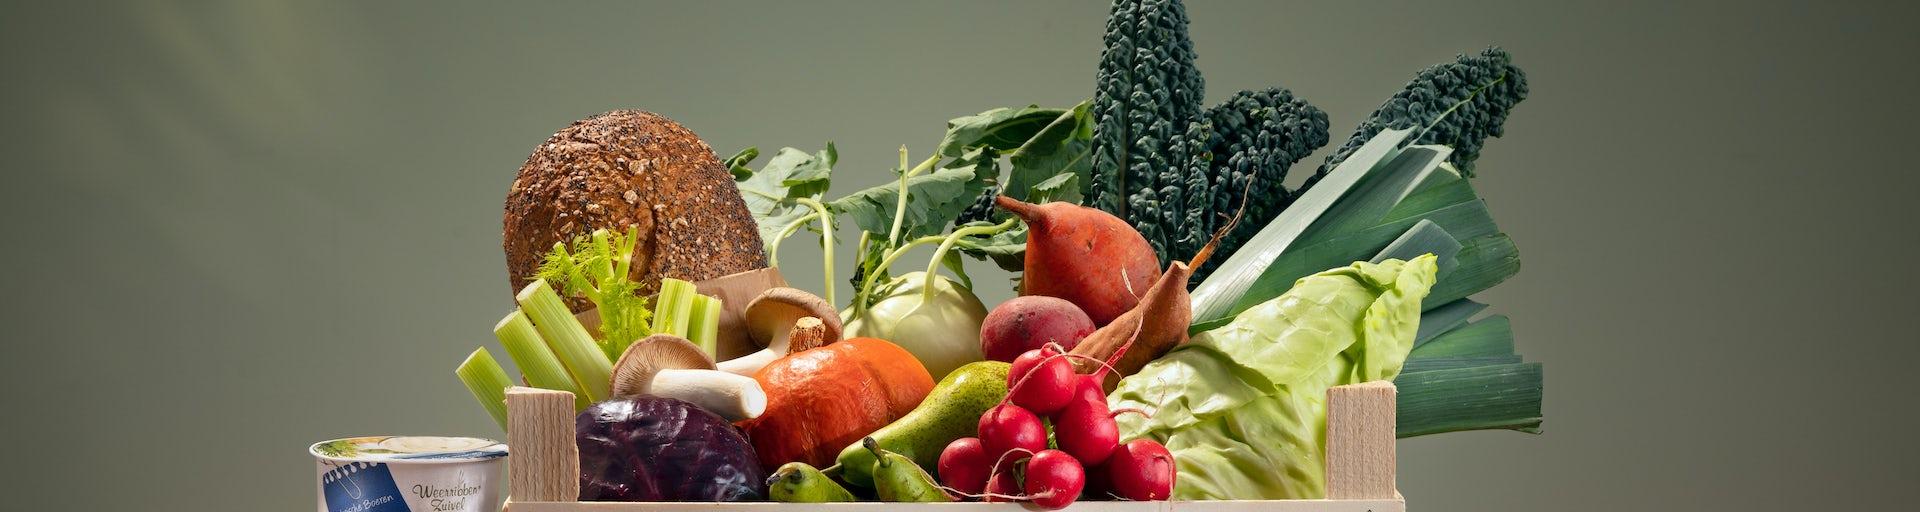 Blog groenten eten